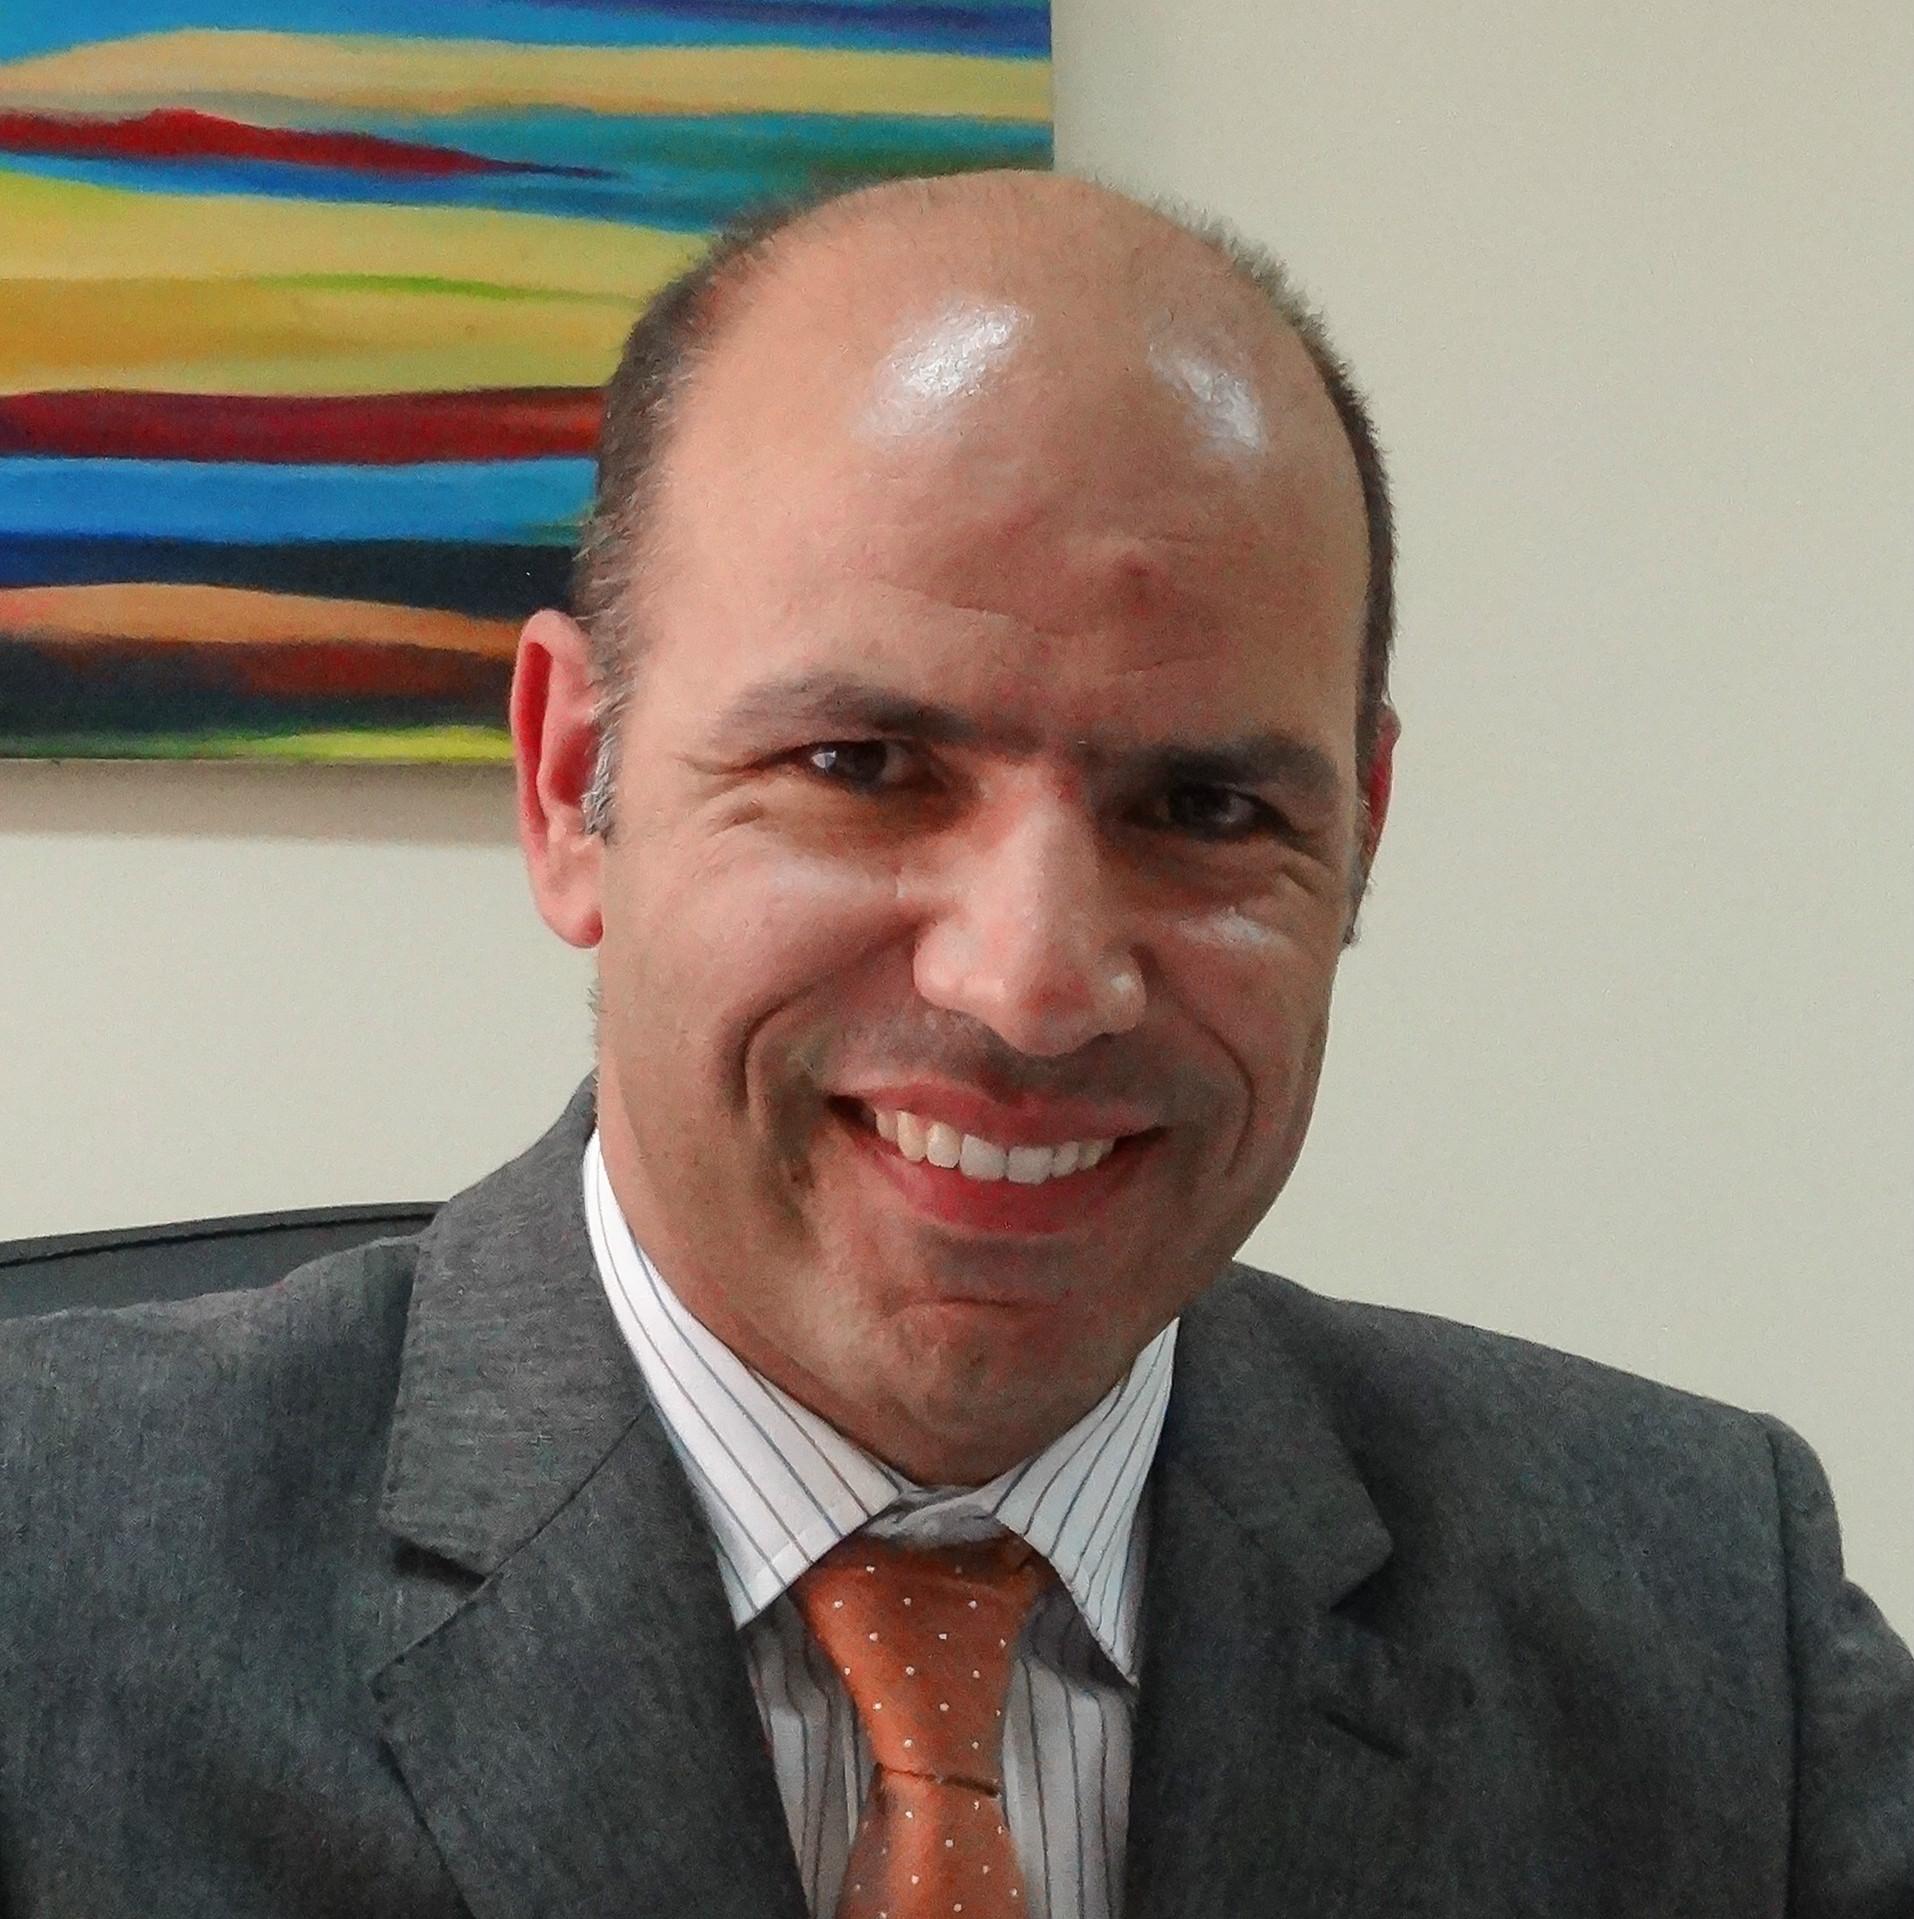 José Miguel Dias Paiva e Costa